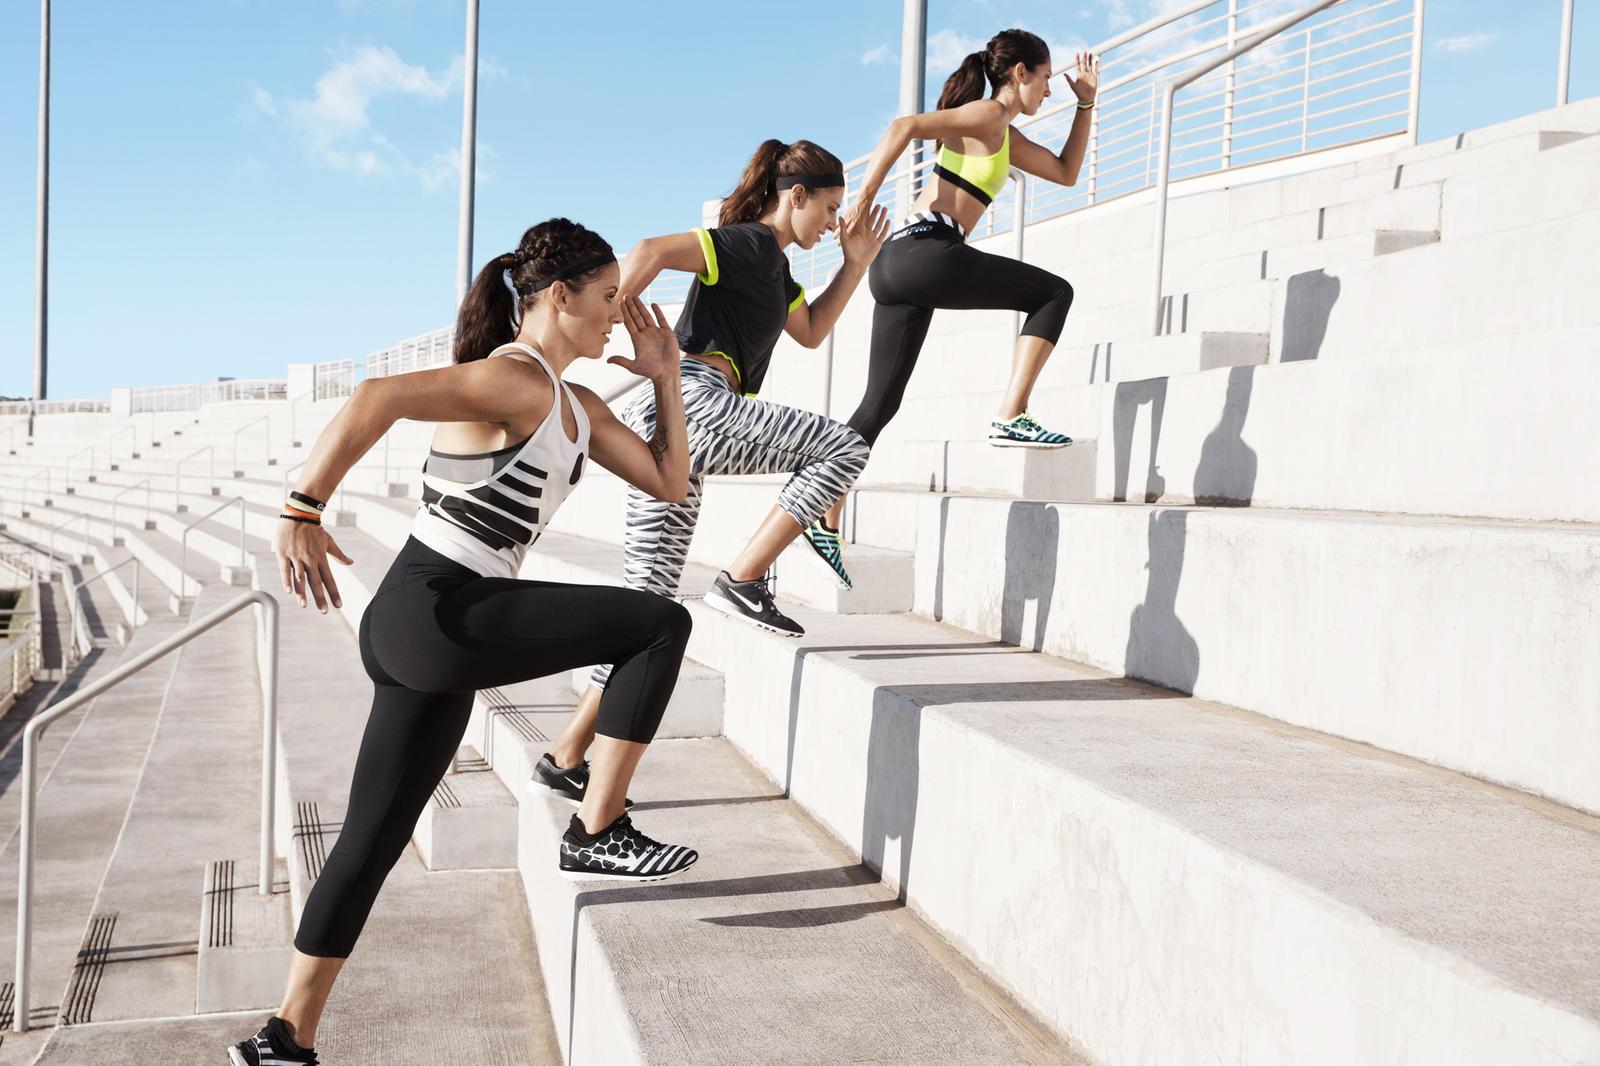 National Sports Nike Shoes